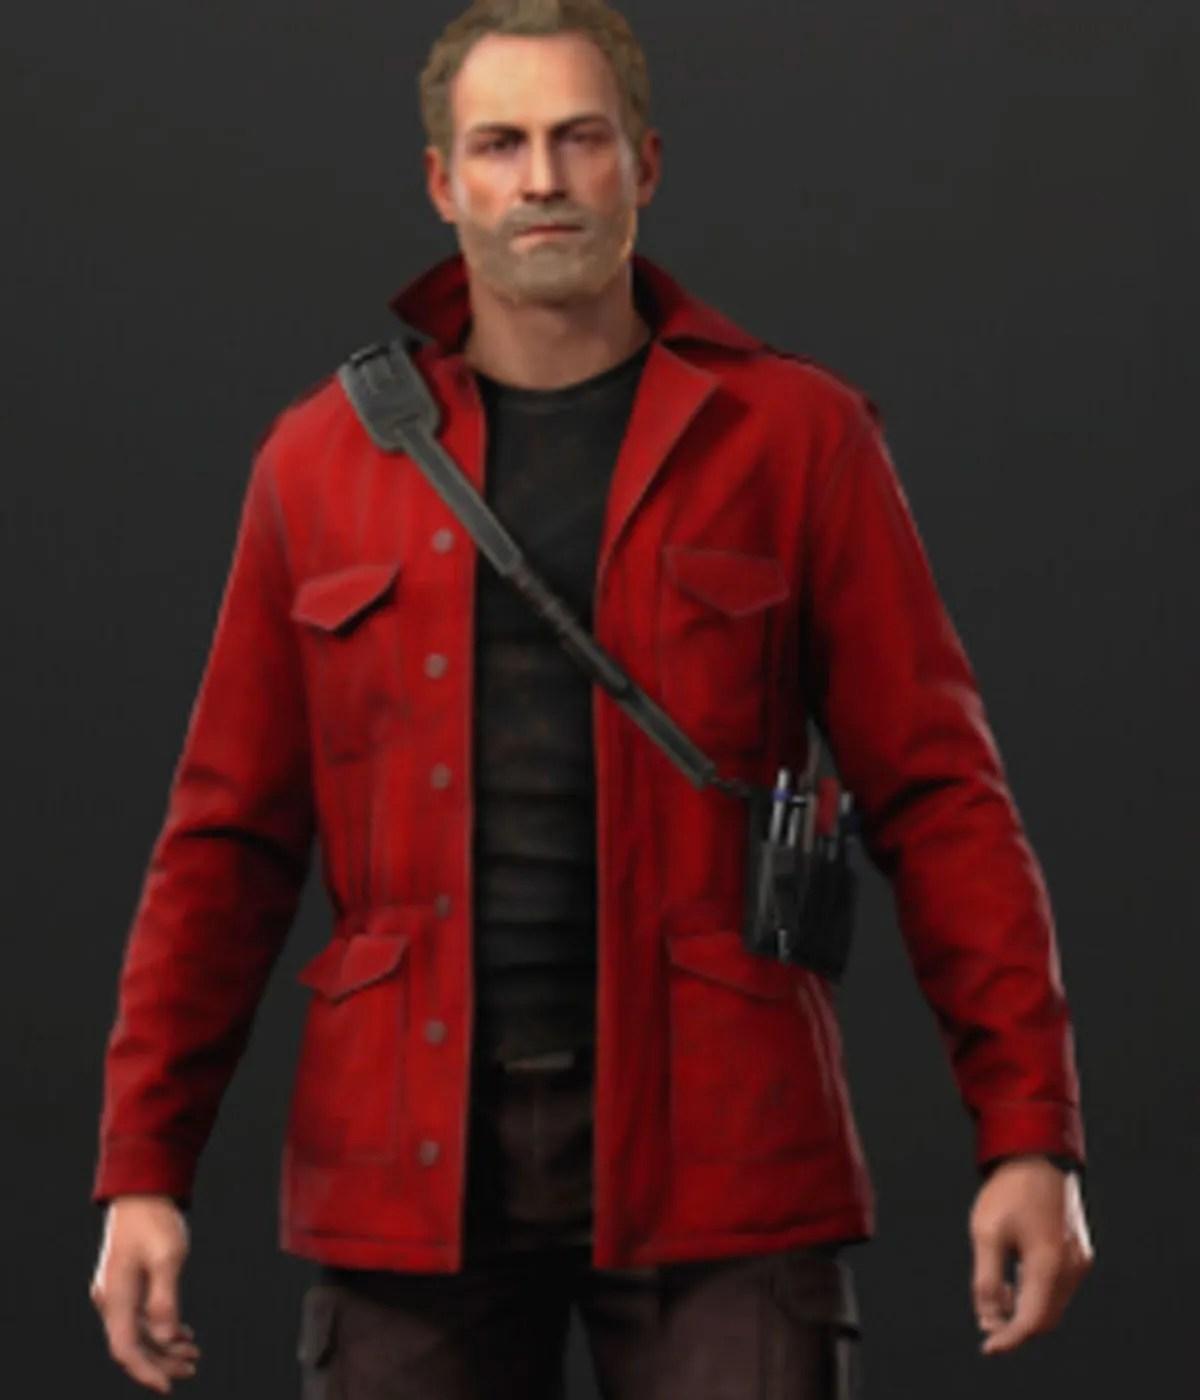 hank-pym-avengers-game-jacket